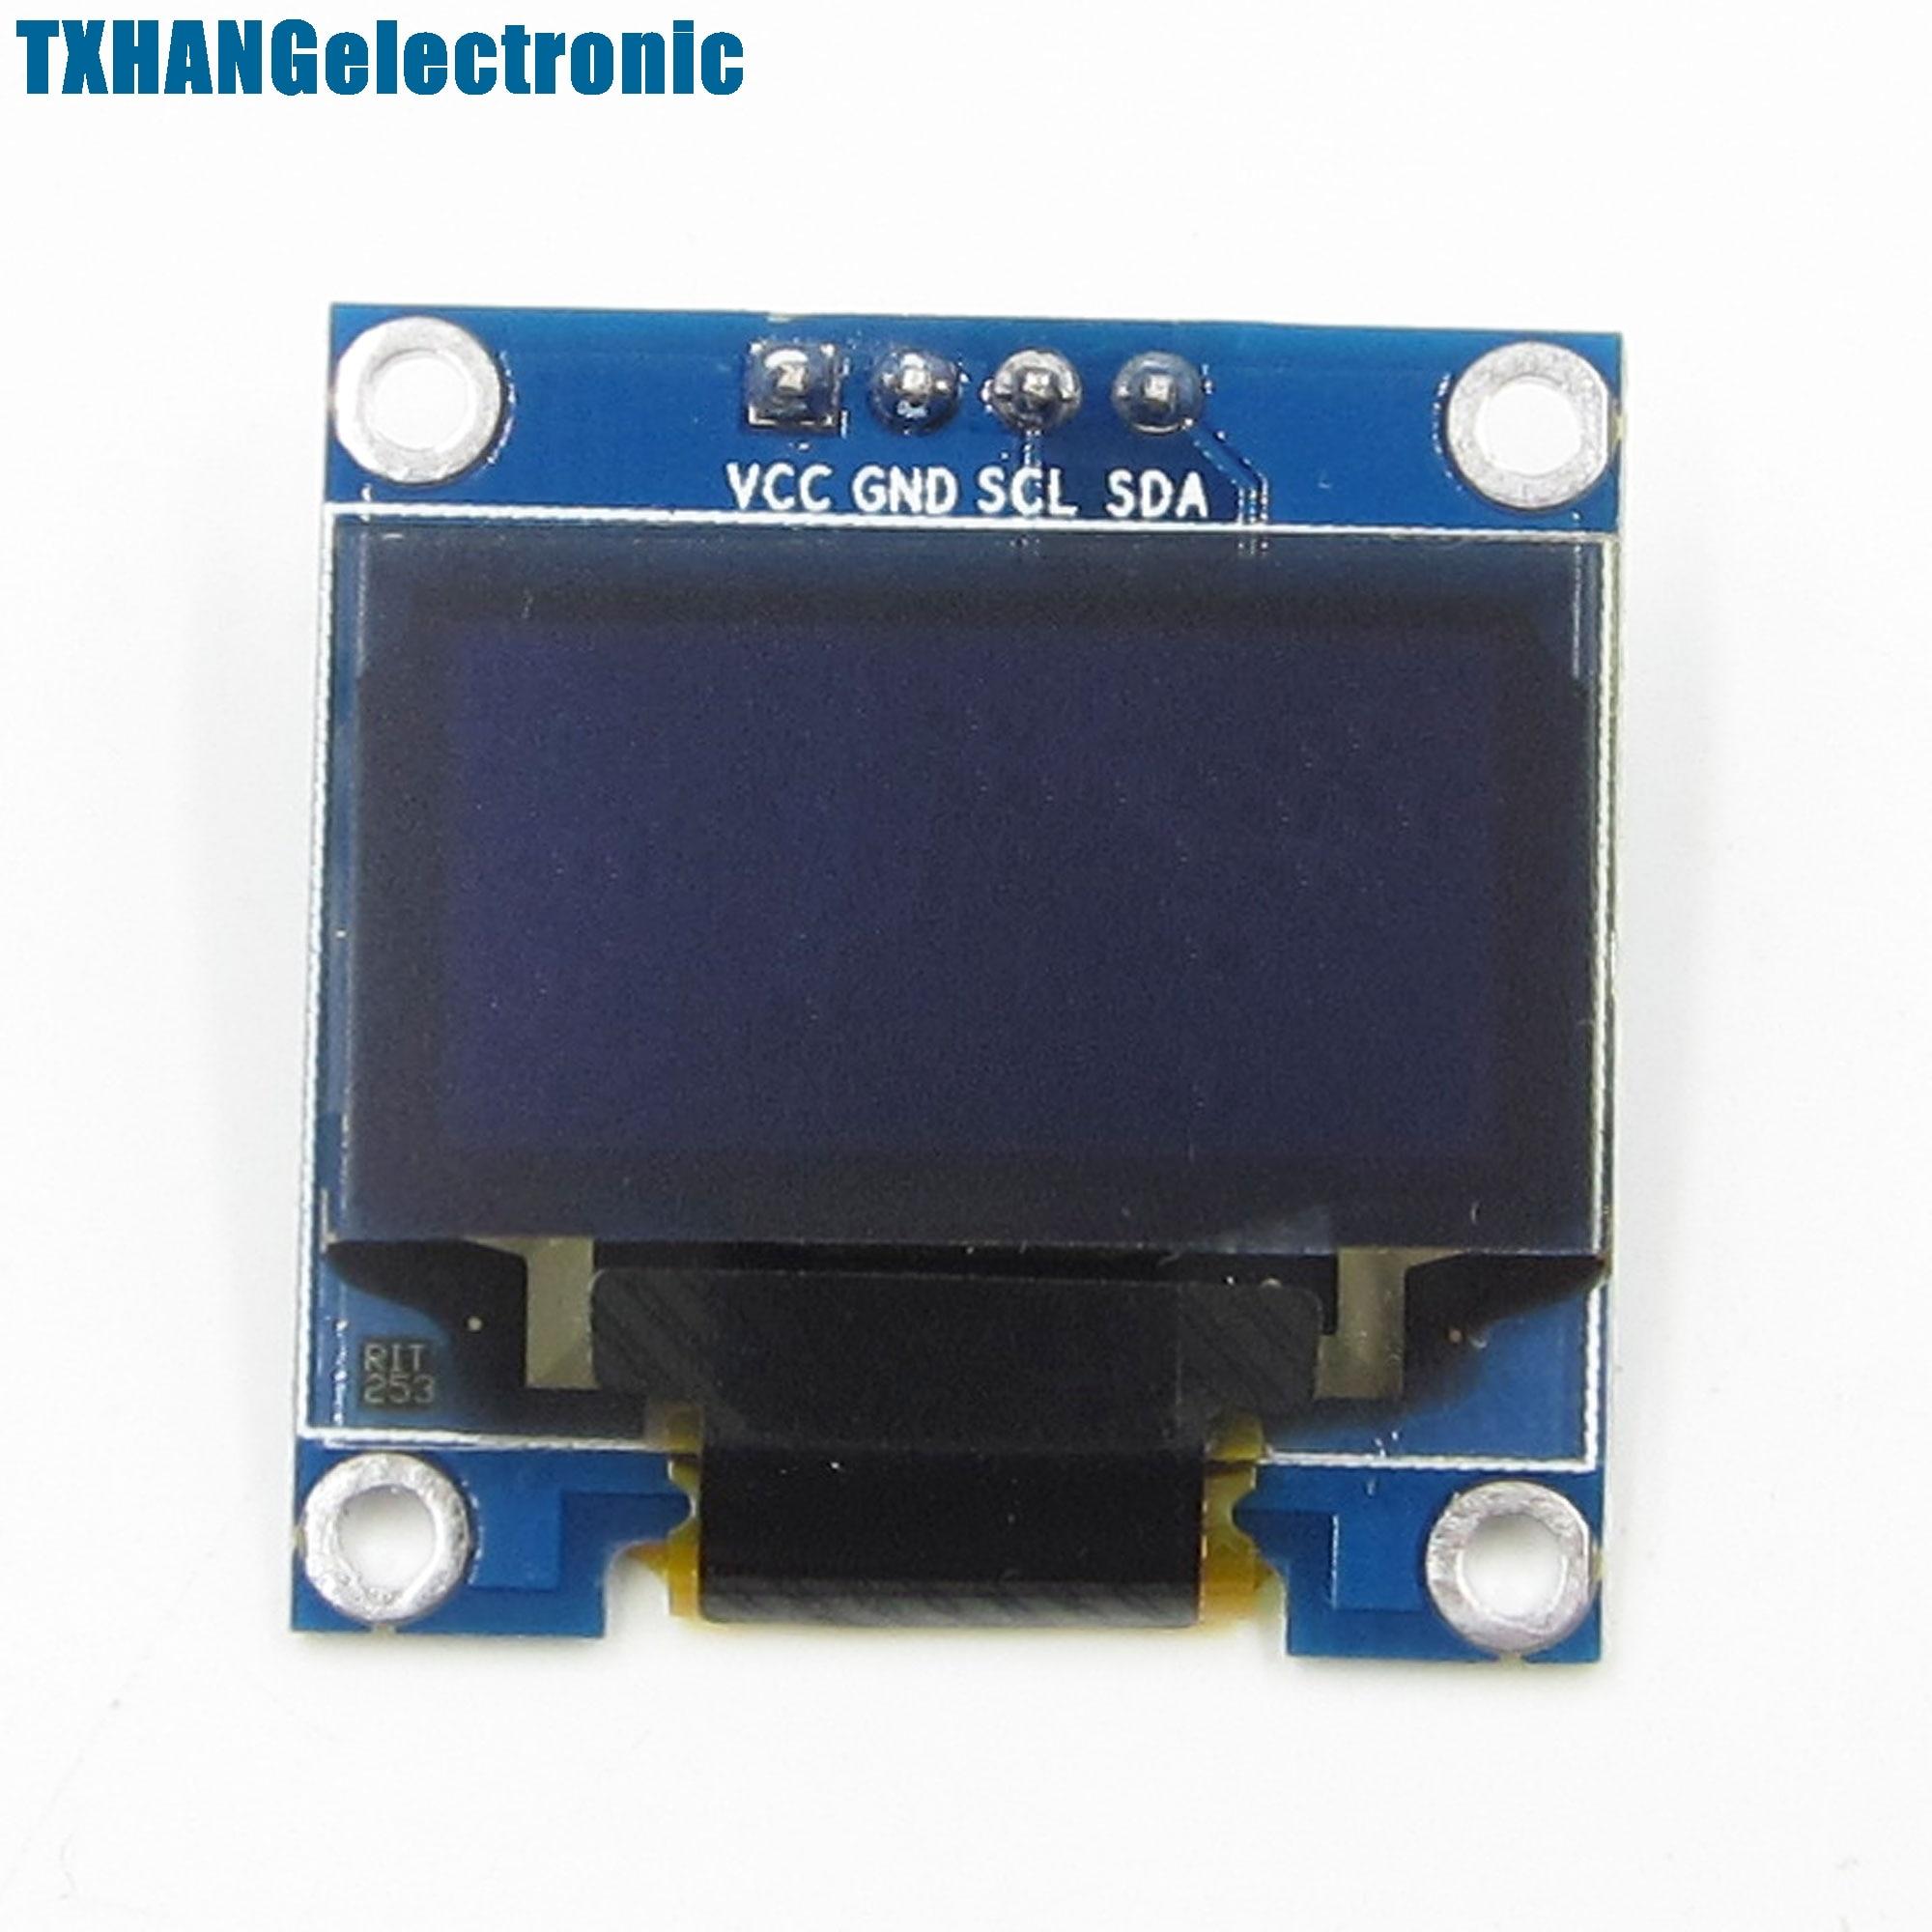 5PCS White 0.96 IIC I2C 128X64 OLED Display Module /M32/AVR/51 for arduino lcd